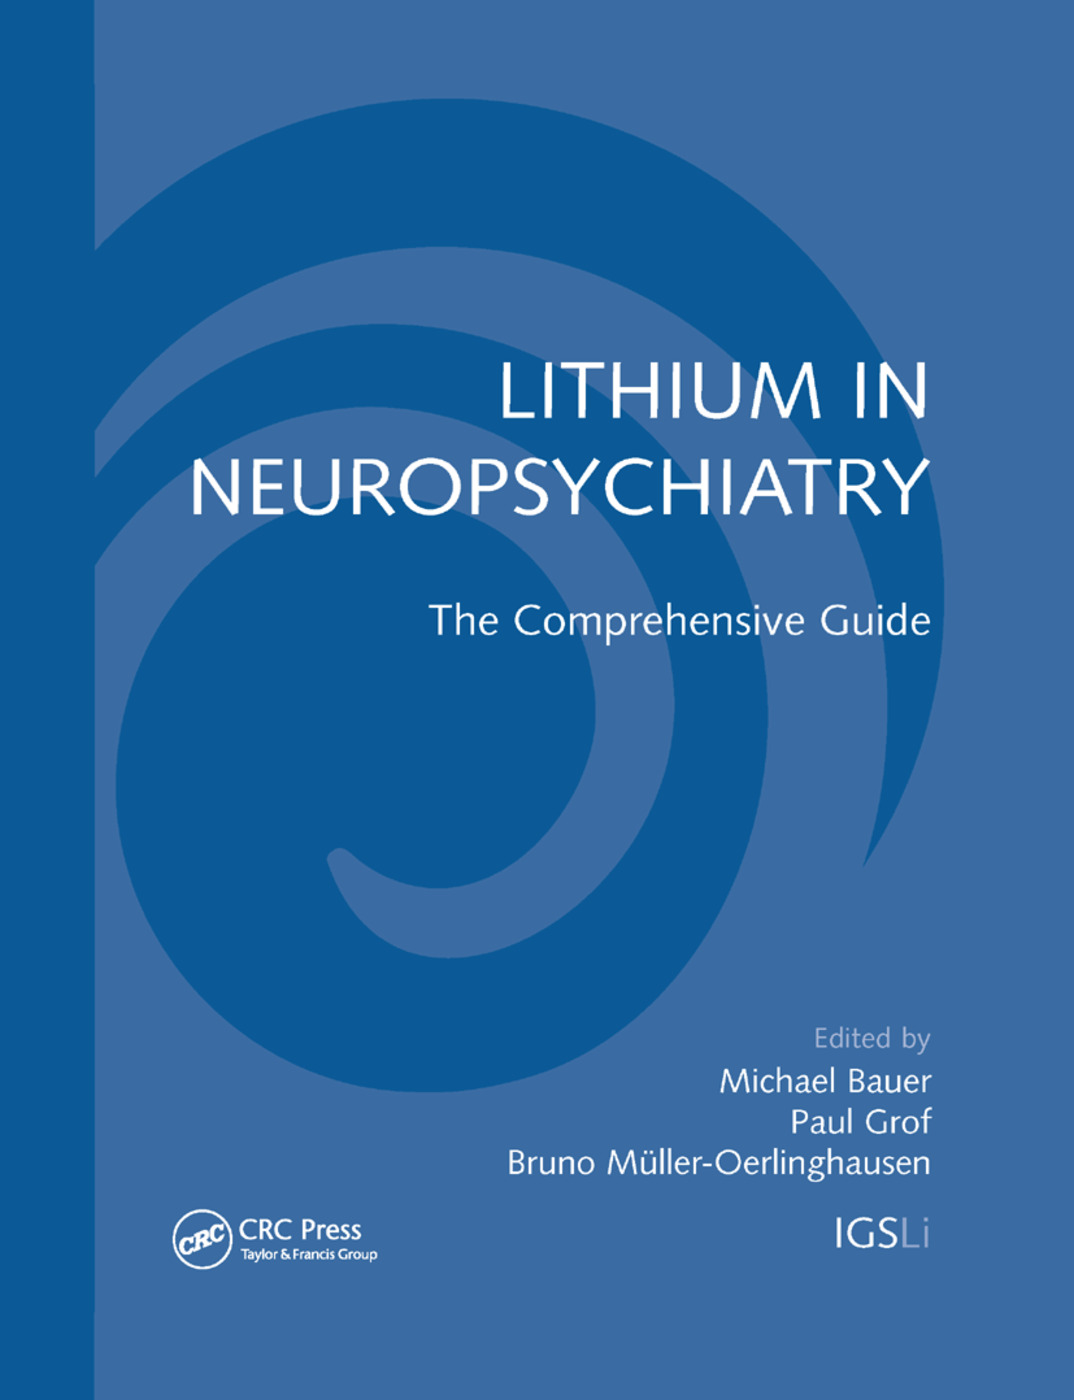 Lithium in Neuropsychiatry